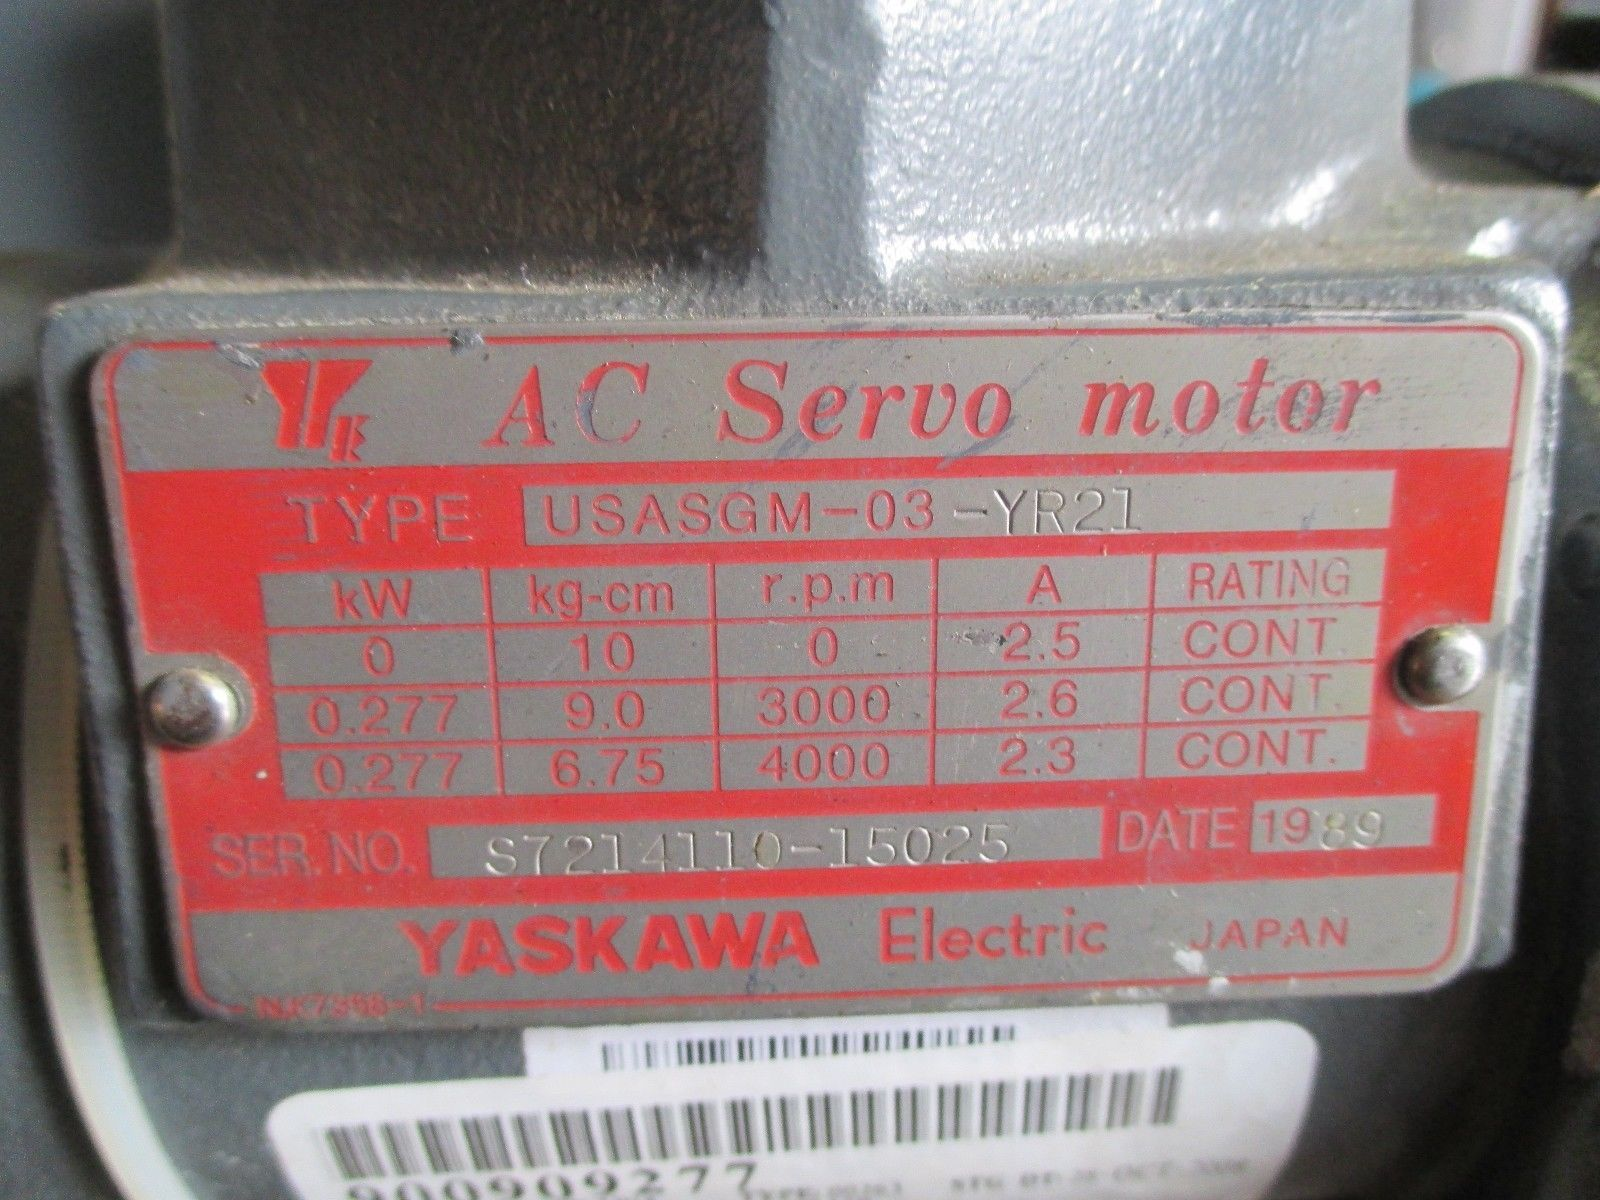 Yaskawa Usasgm 034r21 Ac Servo Motor Industrial Made In Japan Electrical Motors M J Tooling Llc